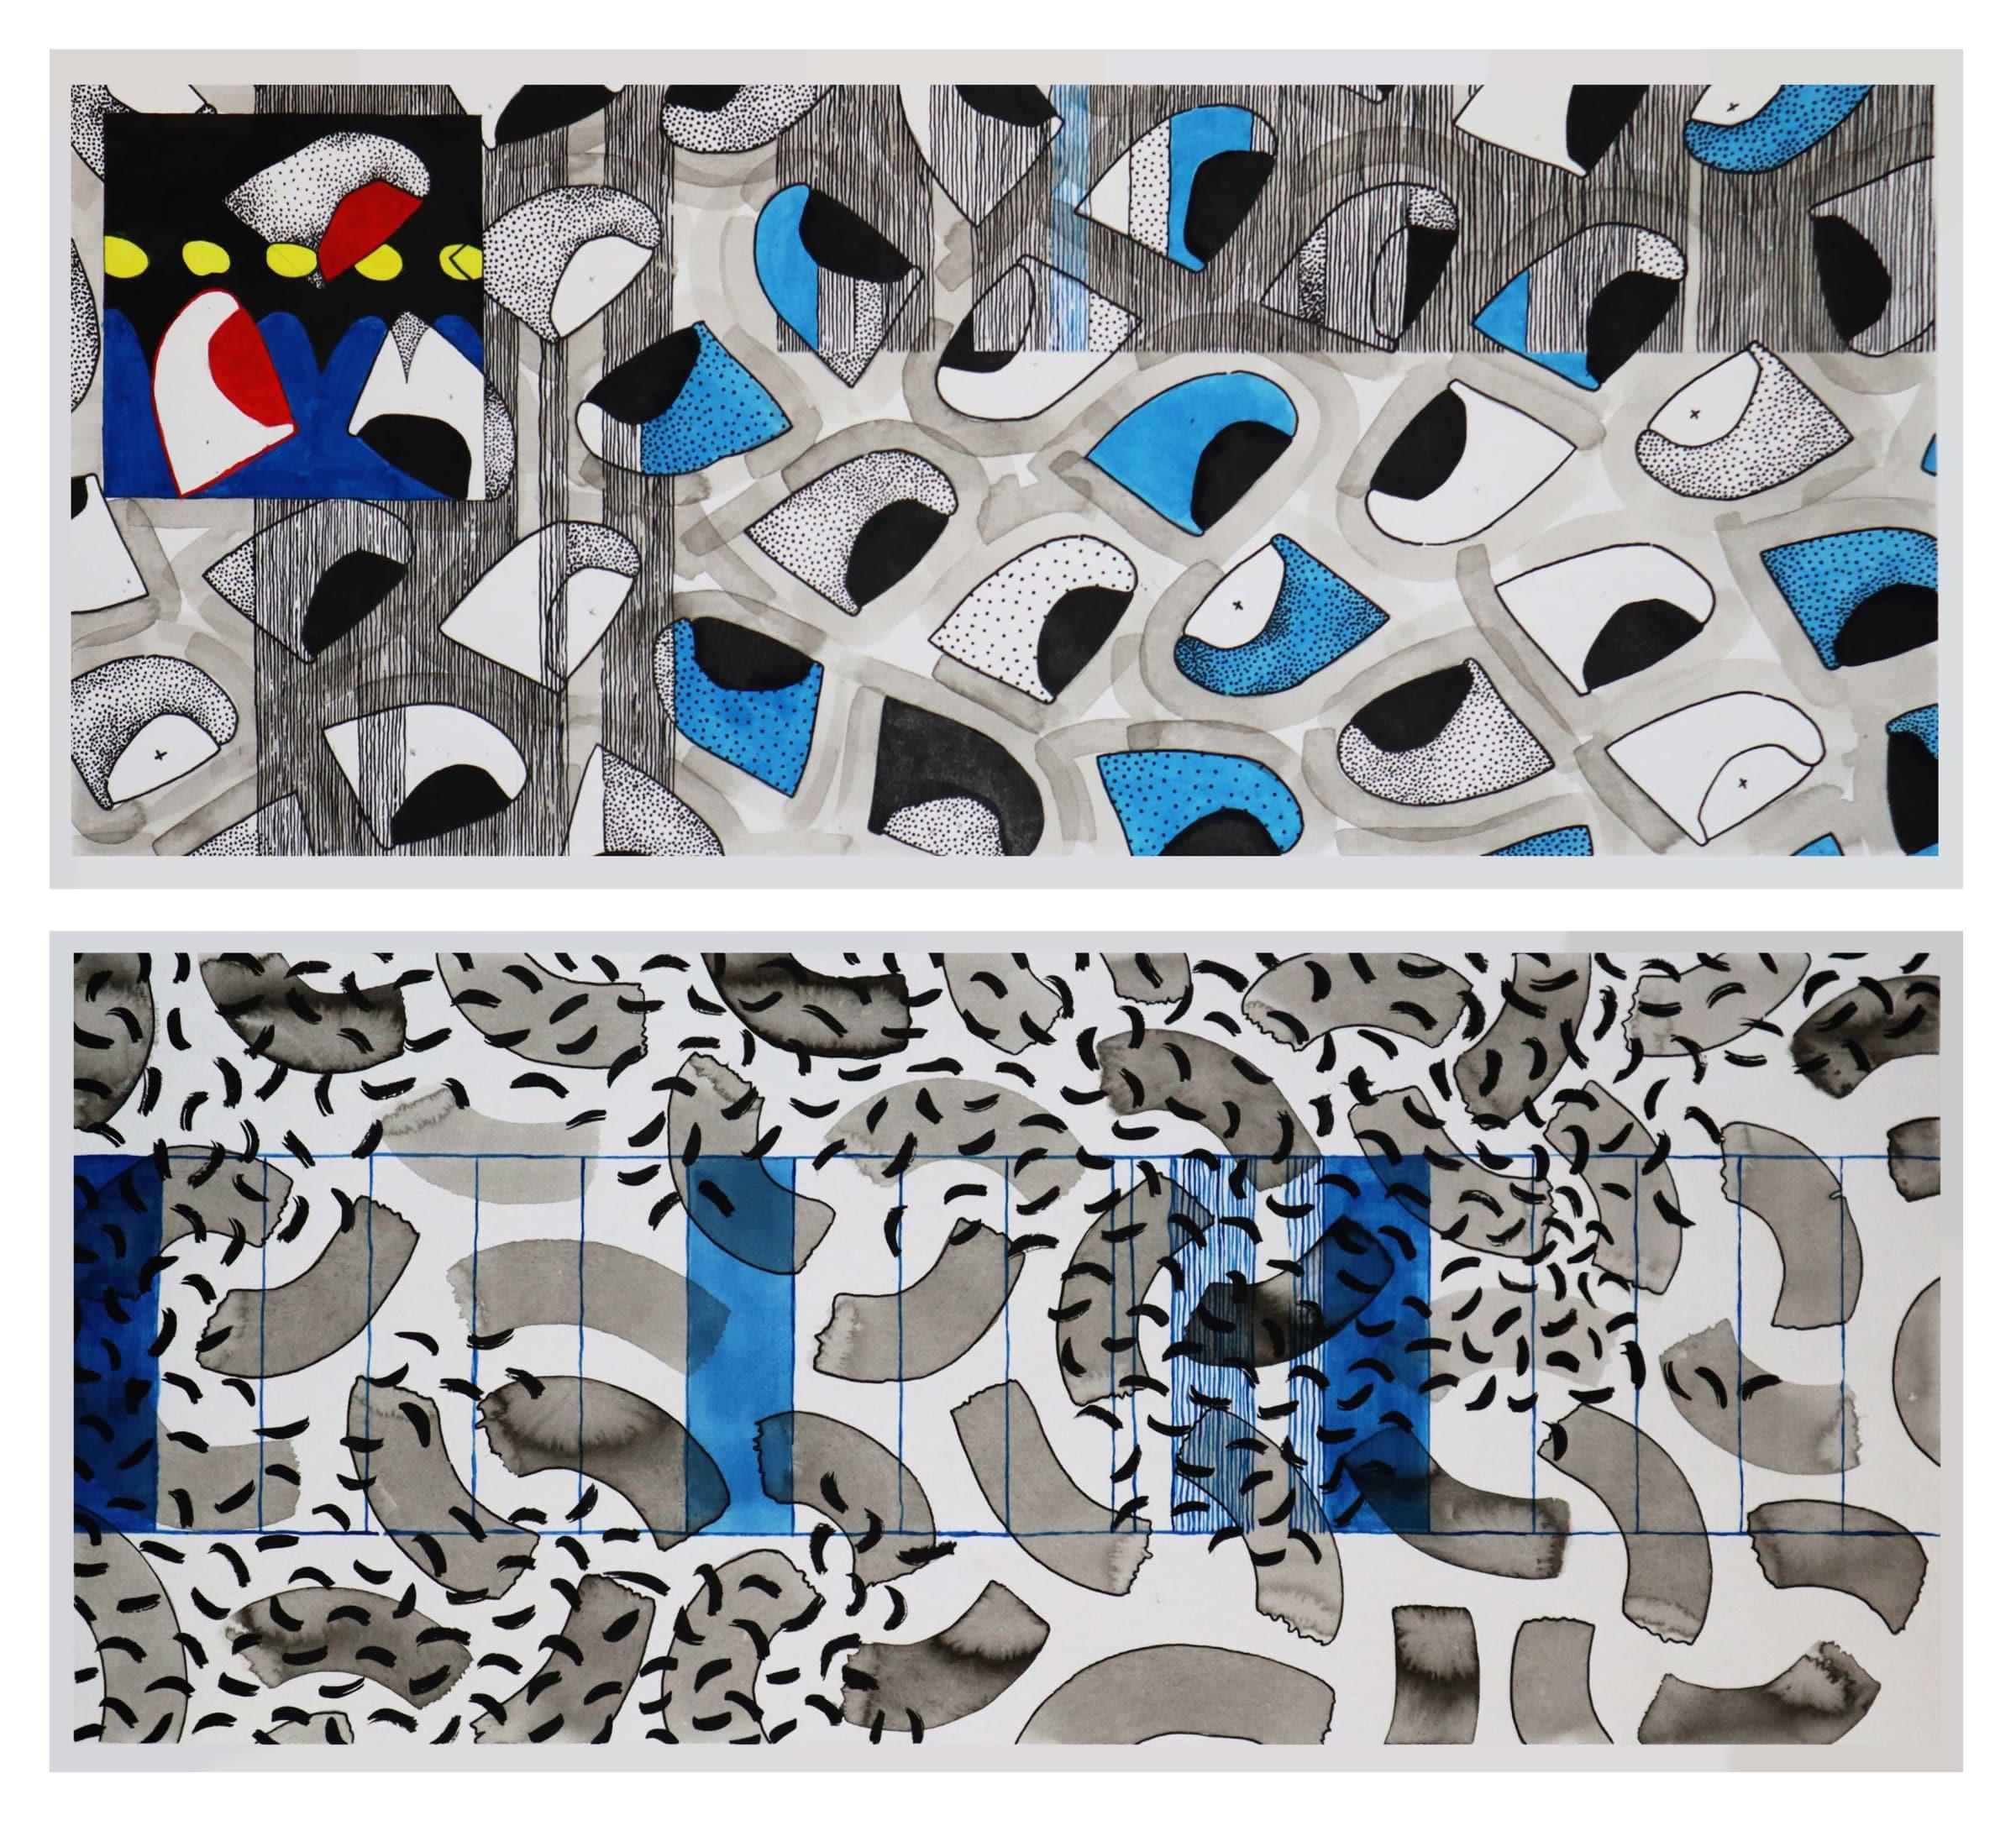 <span class=&#34;link fancybox-details-link&#34;><a href=&#34;/artworks/902-alexandr-vosloo-s-is-for-slip-2018/&#34;>View Detail Page</a></span><div class=&#34;artist&#34;><strong>Alexandré Vosloo</strong></div> <div class=&#34;title&#34;><em>'S' Is For Slip</em>, 2018</div> <div class=&#34;medium&#34;>Ink Drawing On Canson 200Gsm</div> <div class=&#34;dimensions&#34;>43cm x 49cm</div>